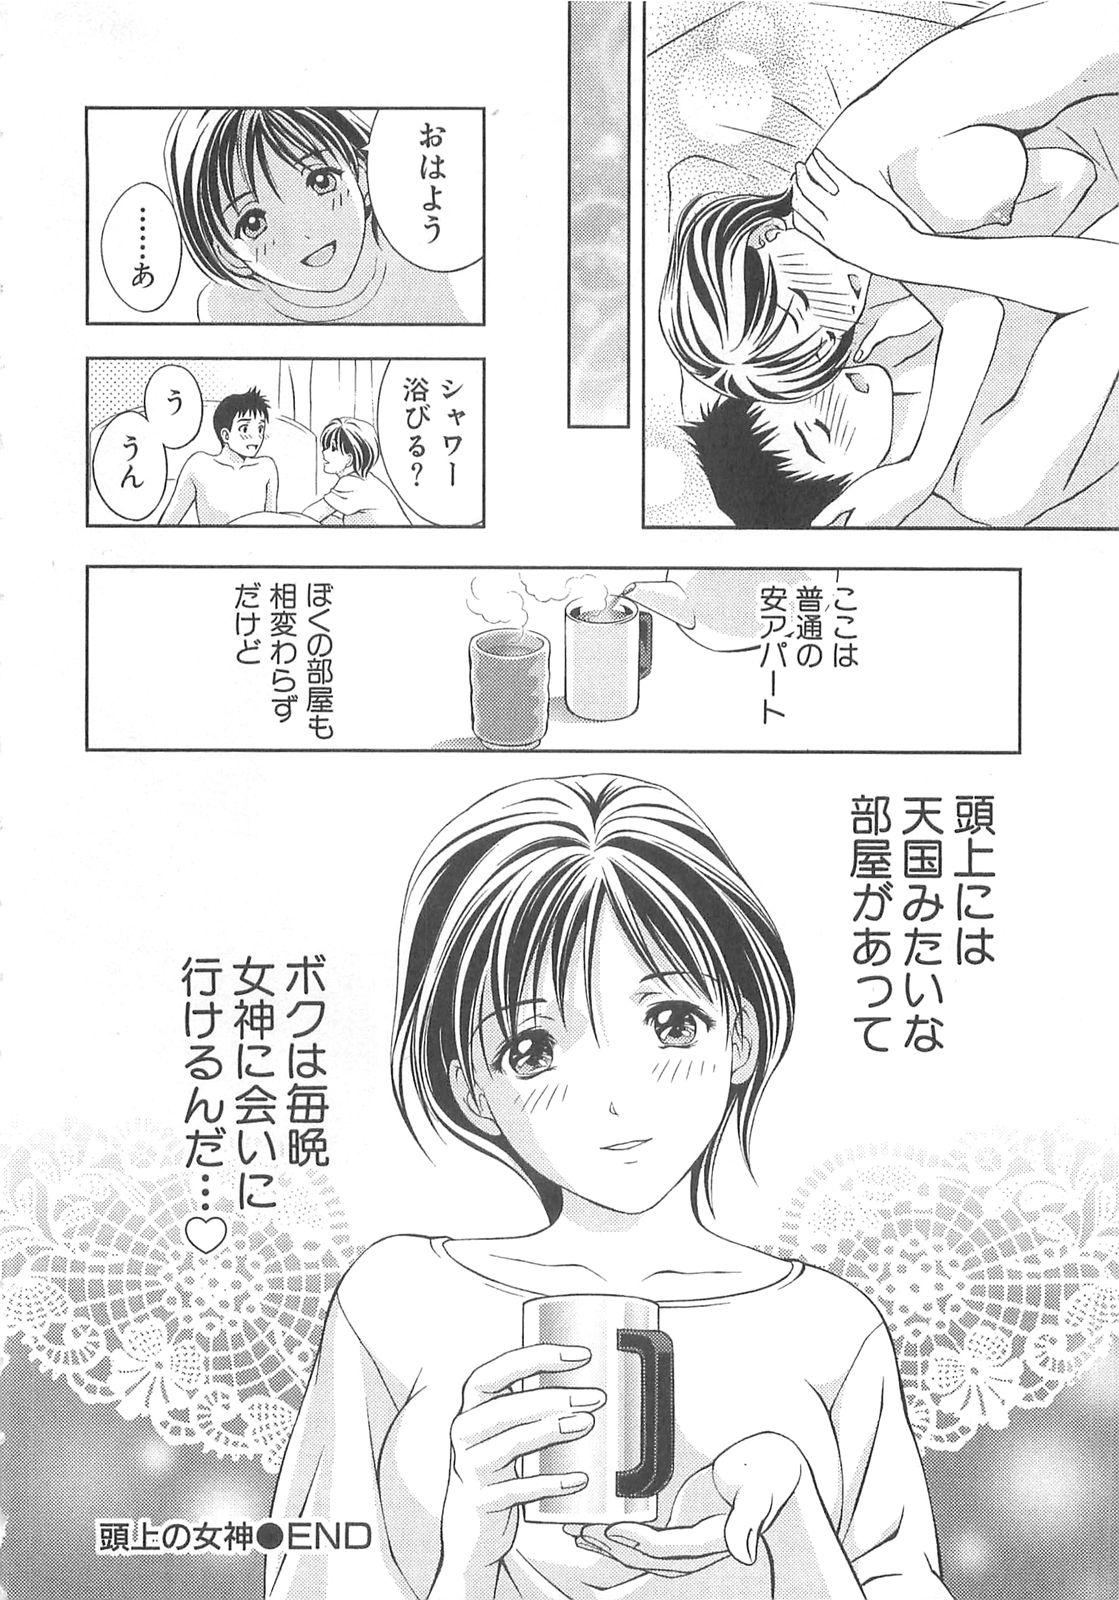 Tenshi no Kyuu - Angel's Pretty Hip 46